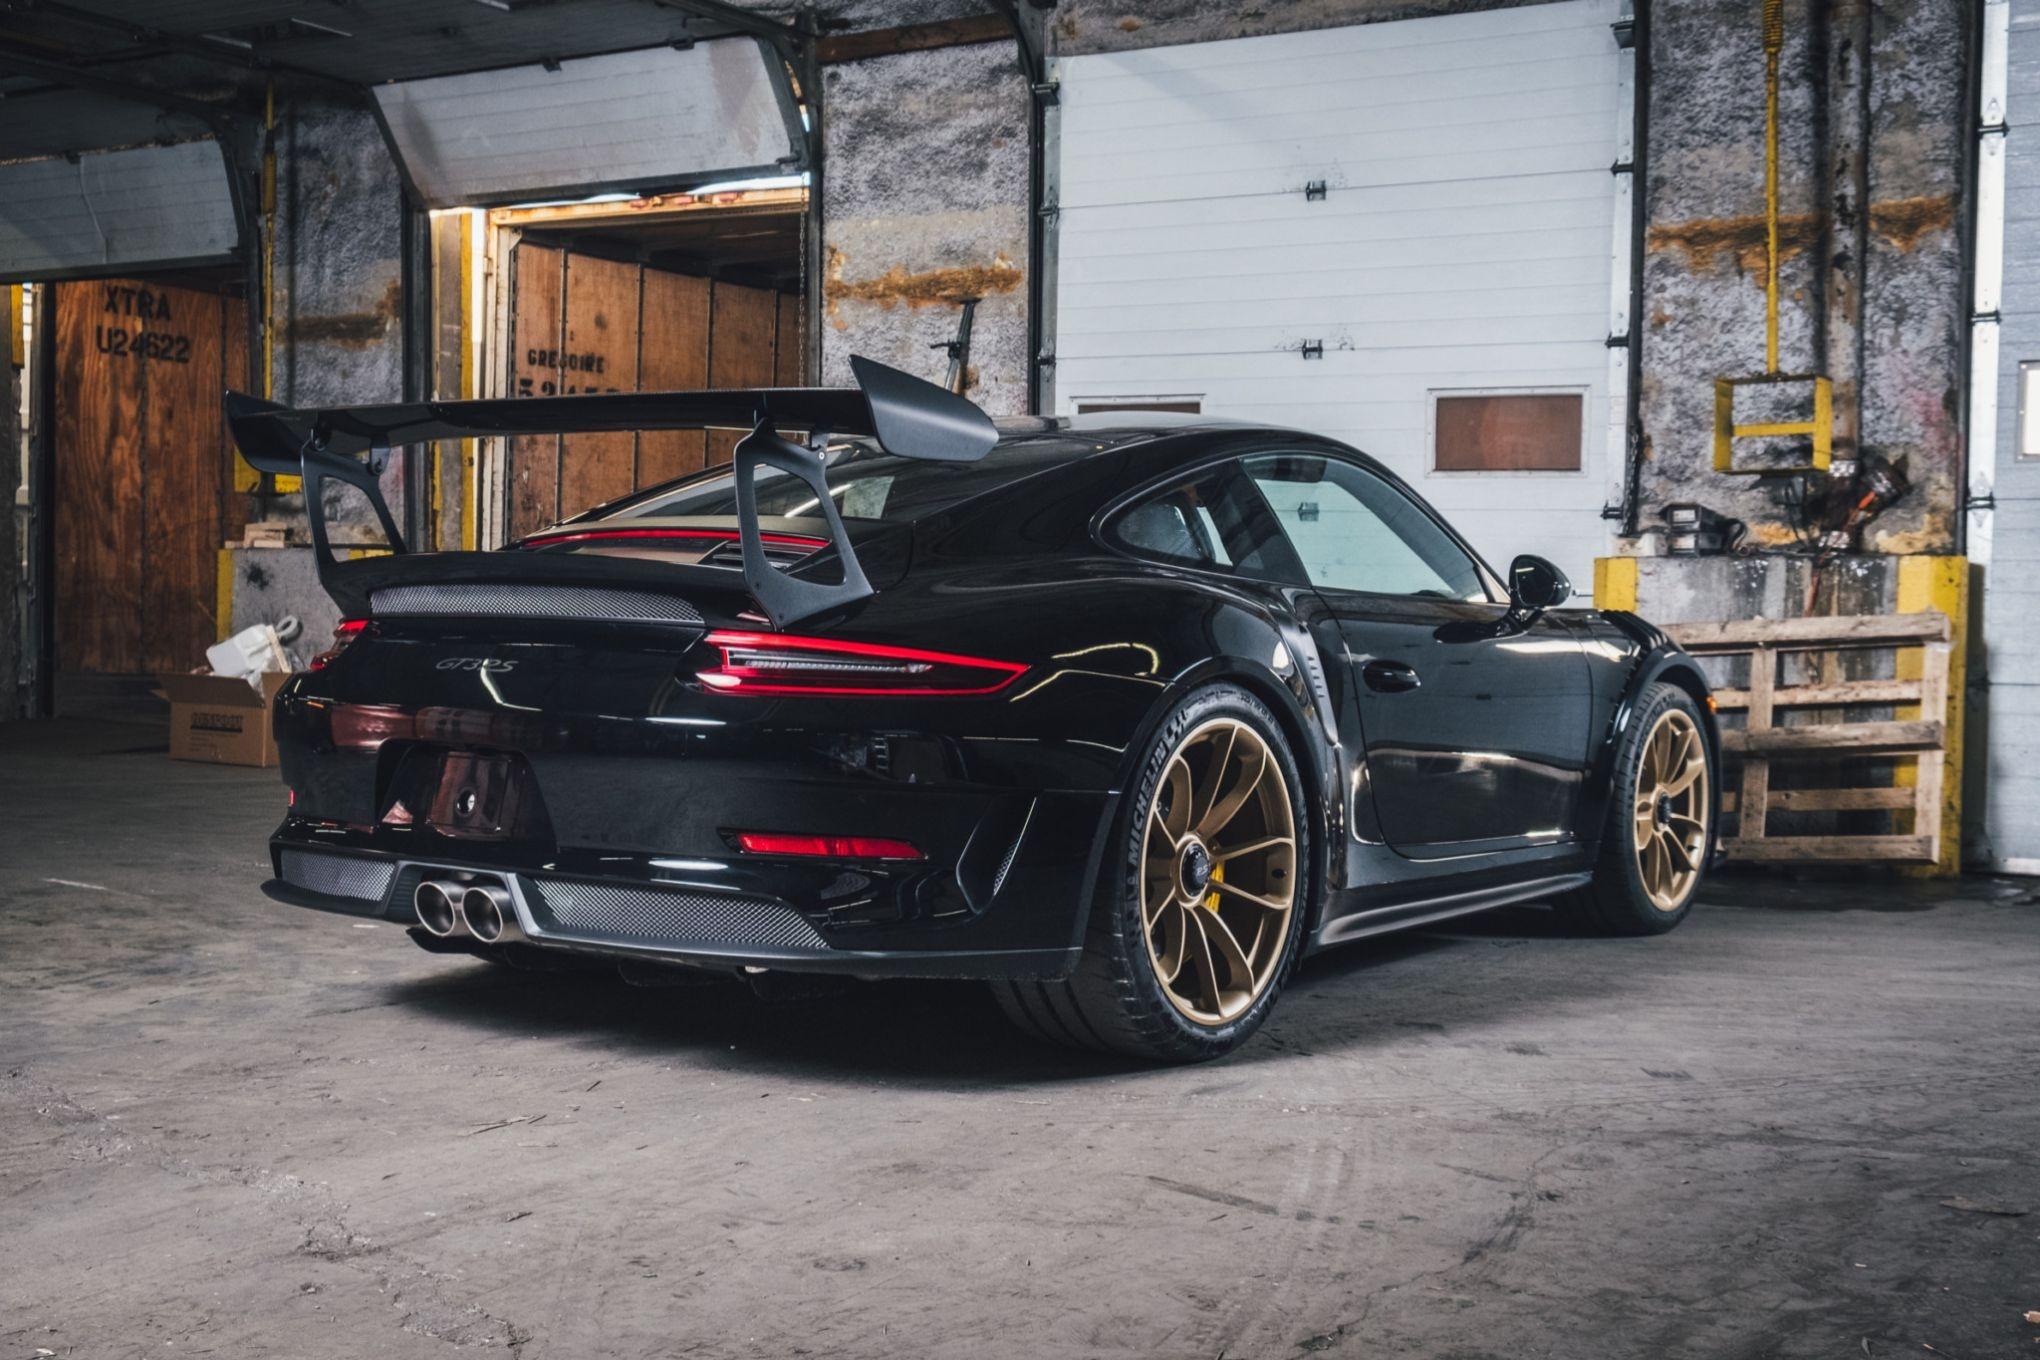 DT 2019 Porsche 911 GT3 RS Weissach Edition